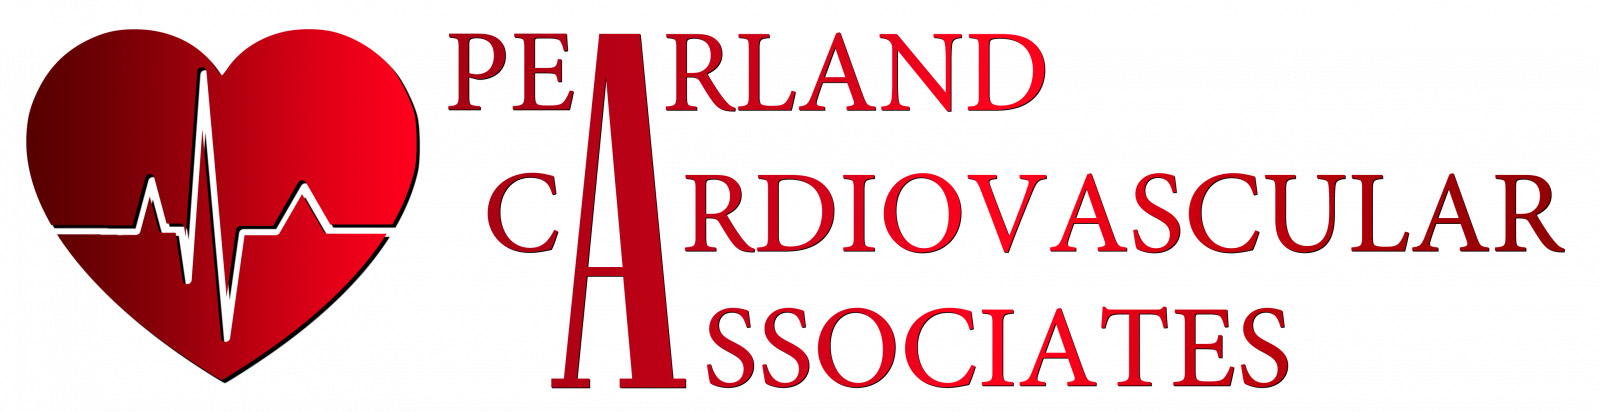 Pearland Cardiovascular Associates Logo